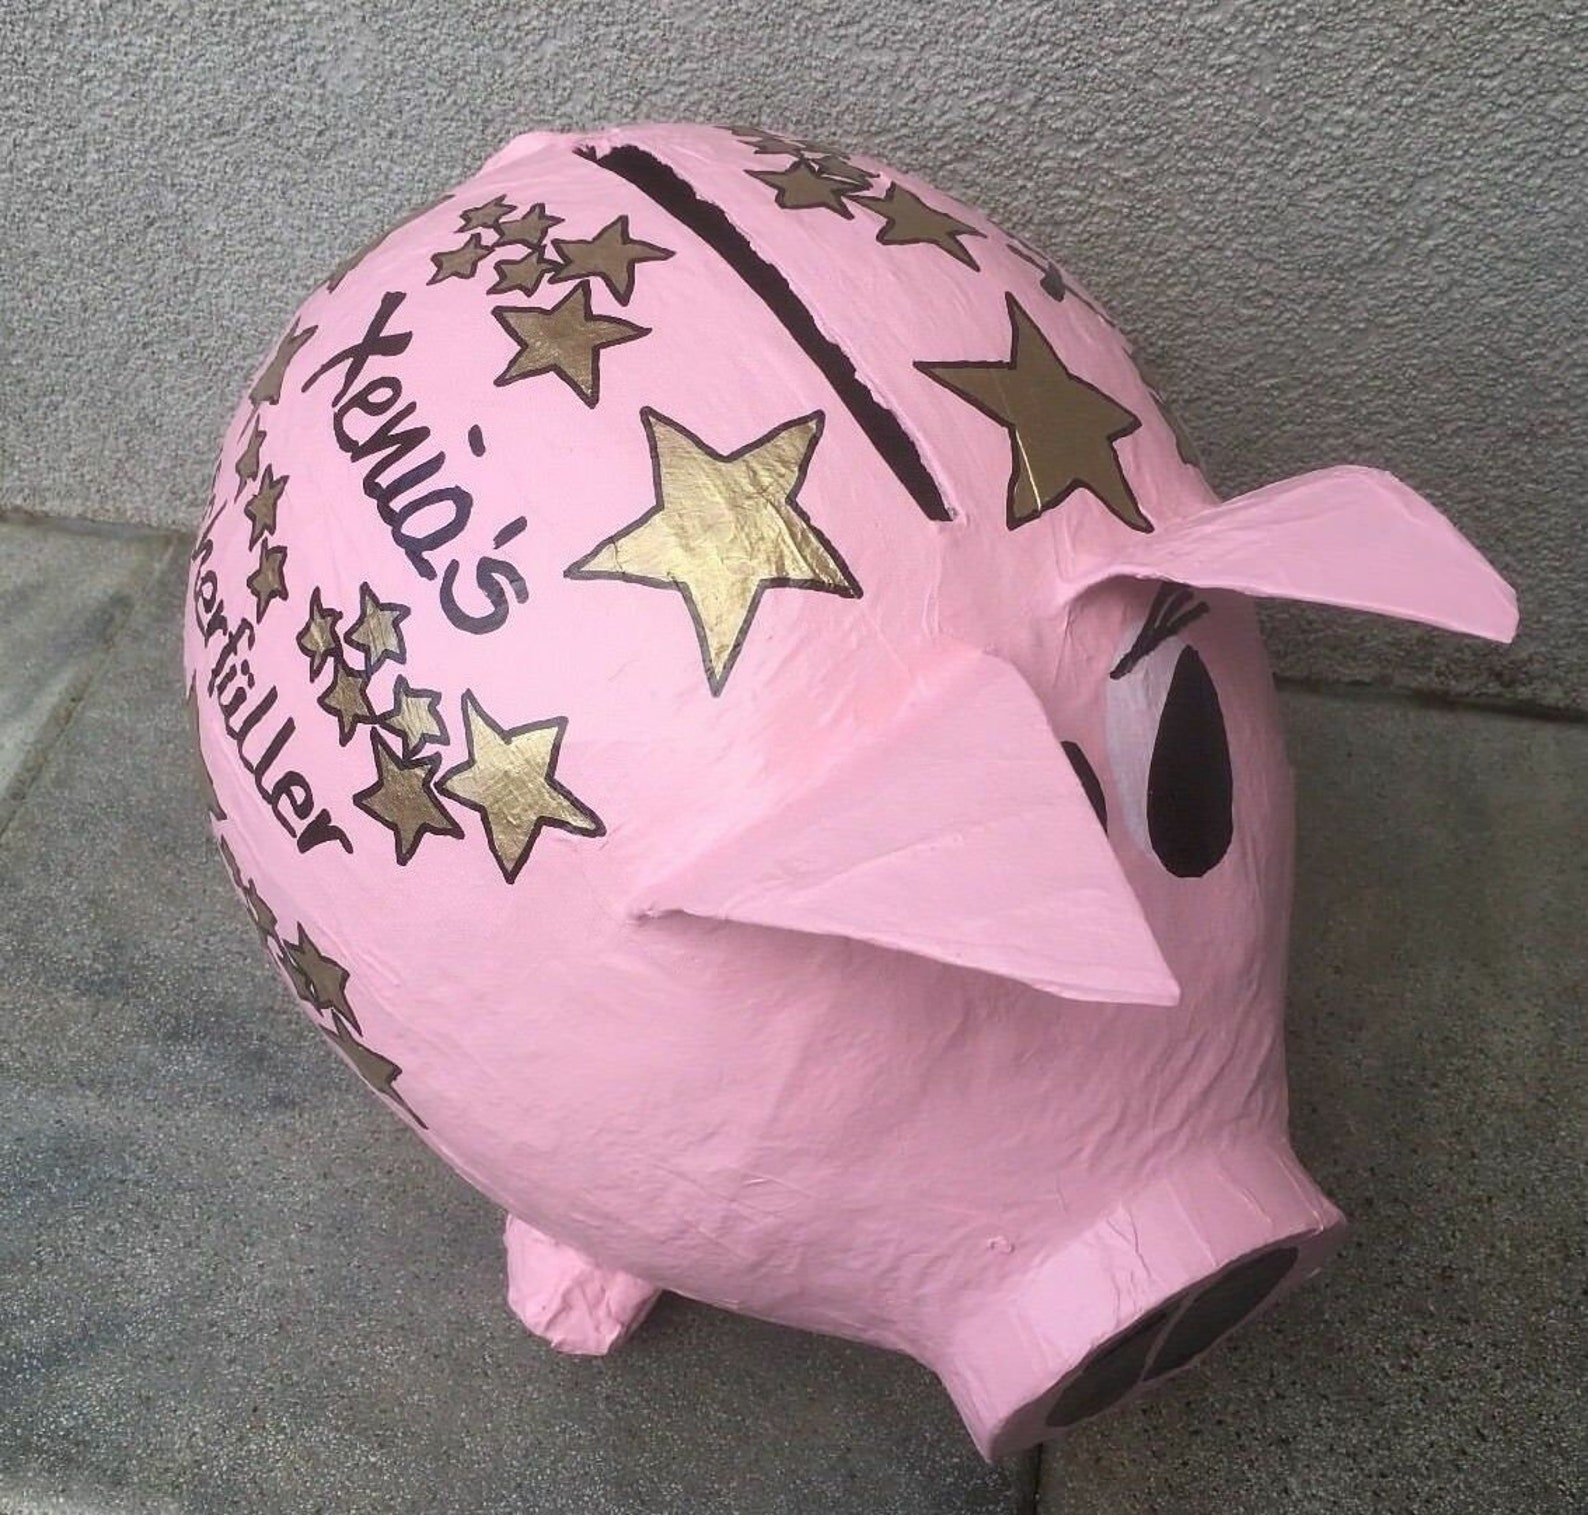 piggy bank xxl wishful pig money gift 40th birthday card